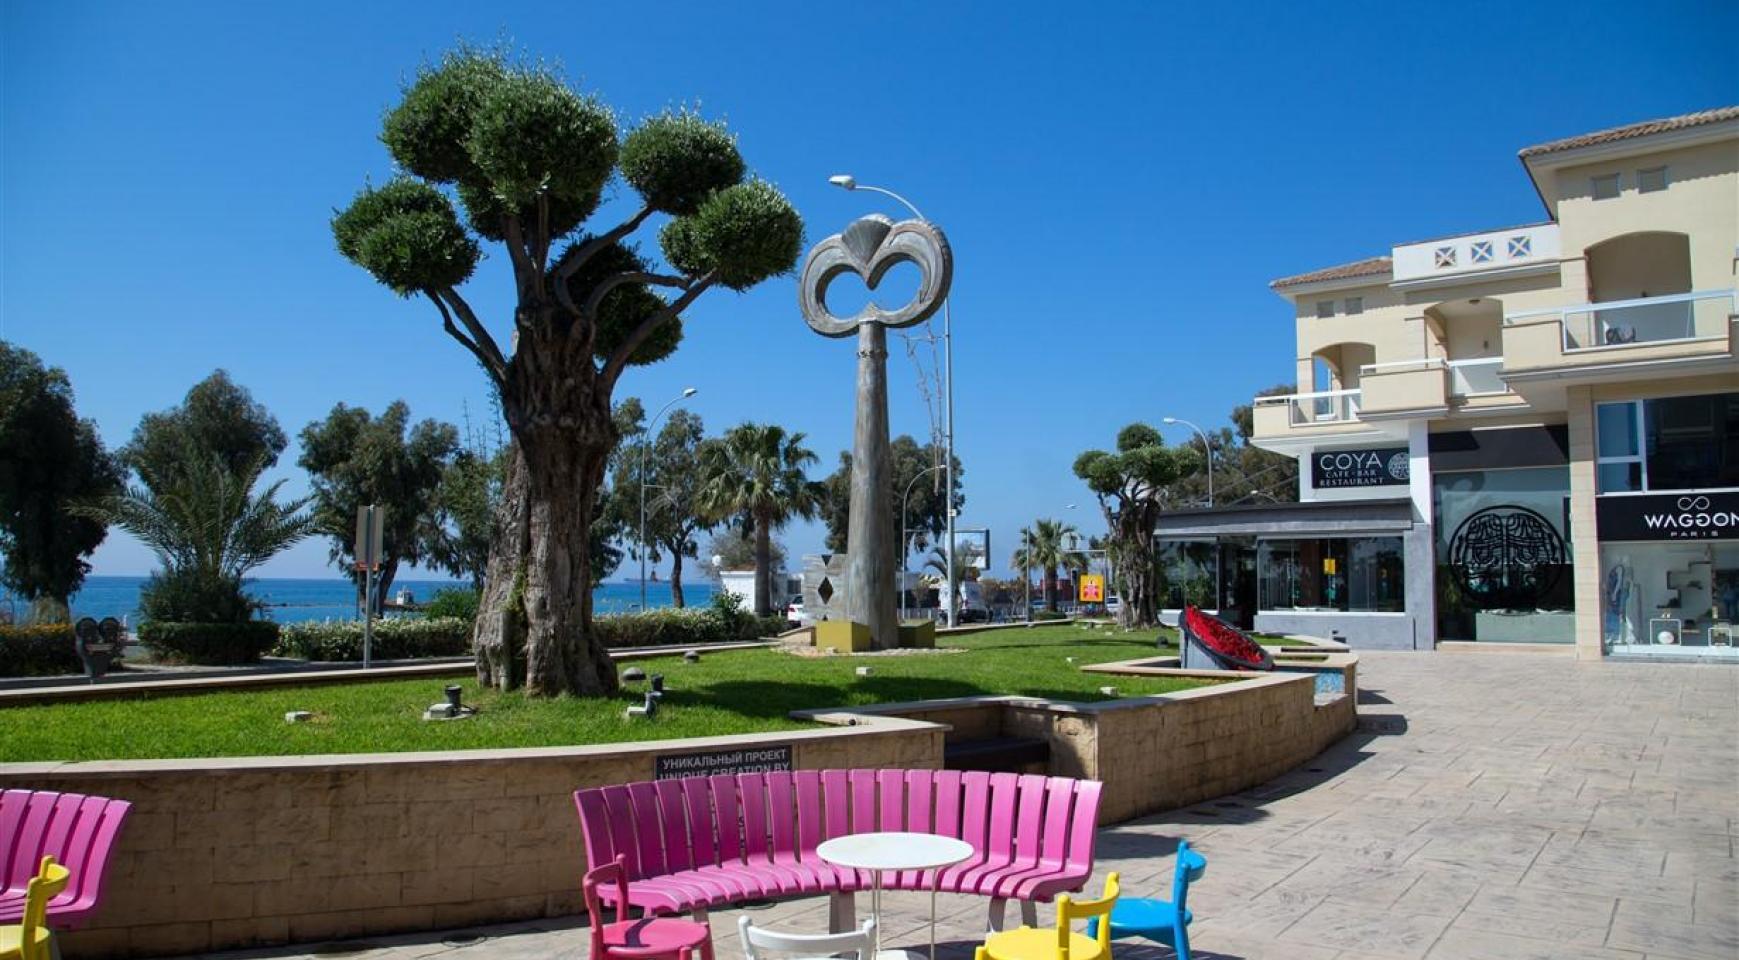 Luxury 2 Bedroom Apartment Mesogios Iris 304 in the Tourist area near the Beach - 39